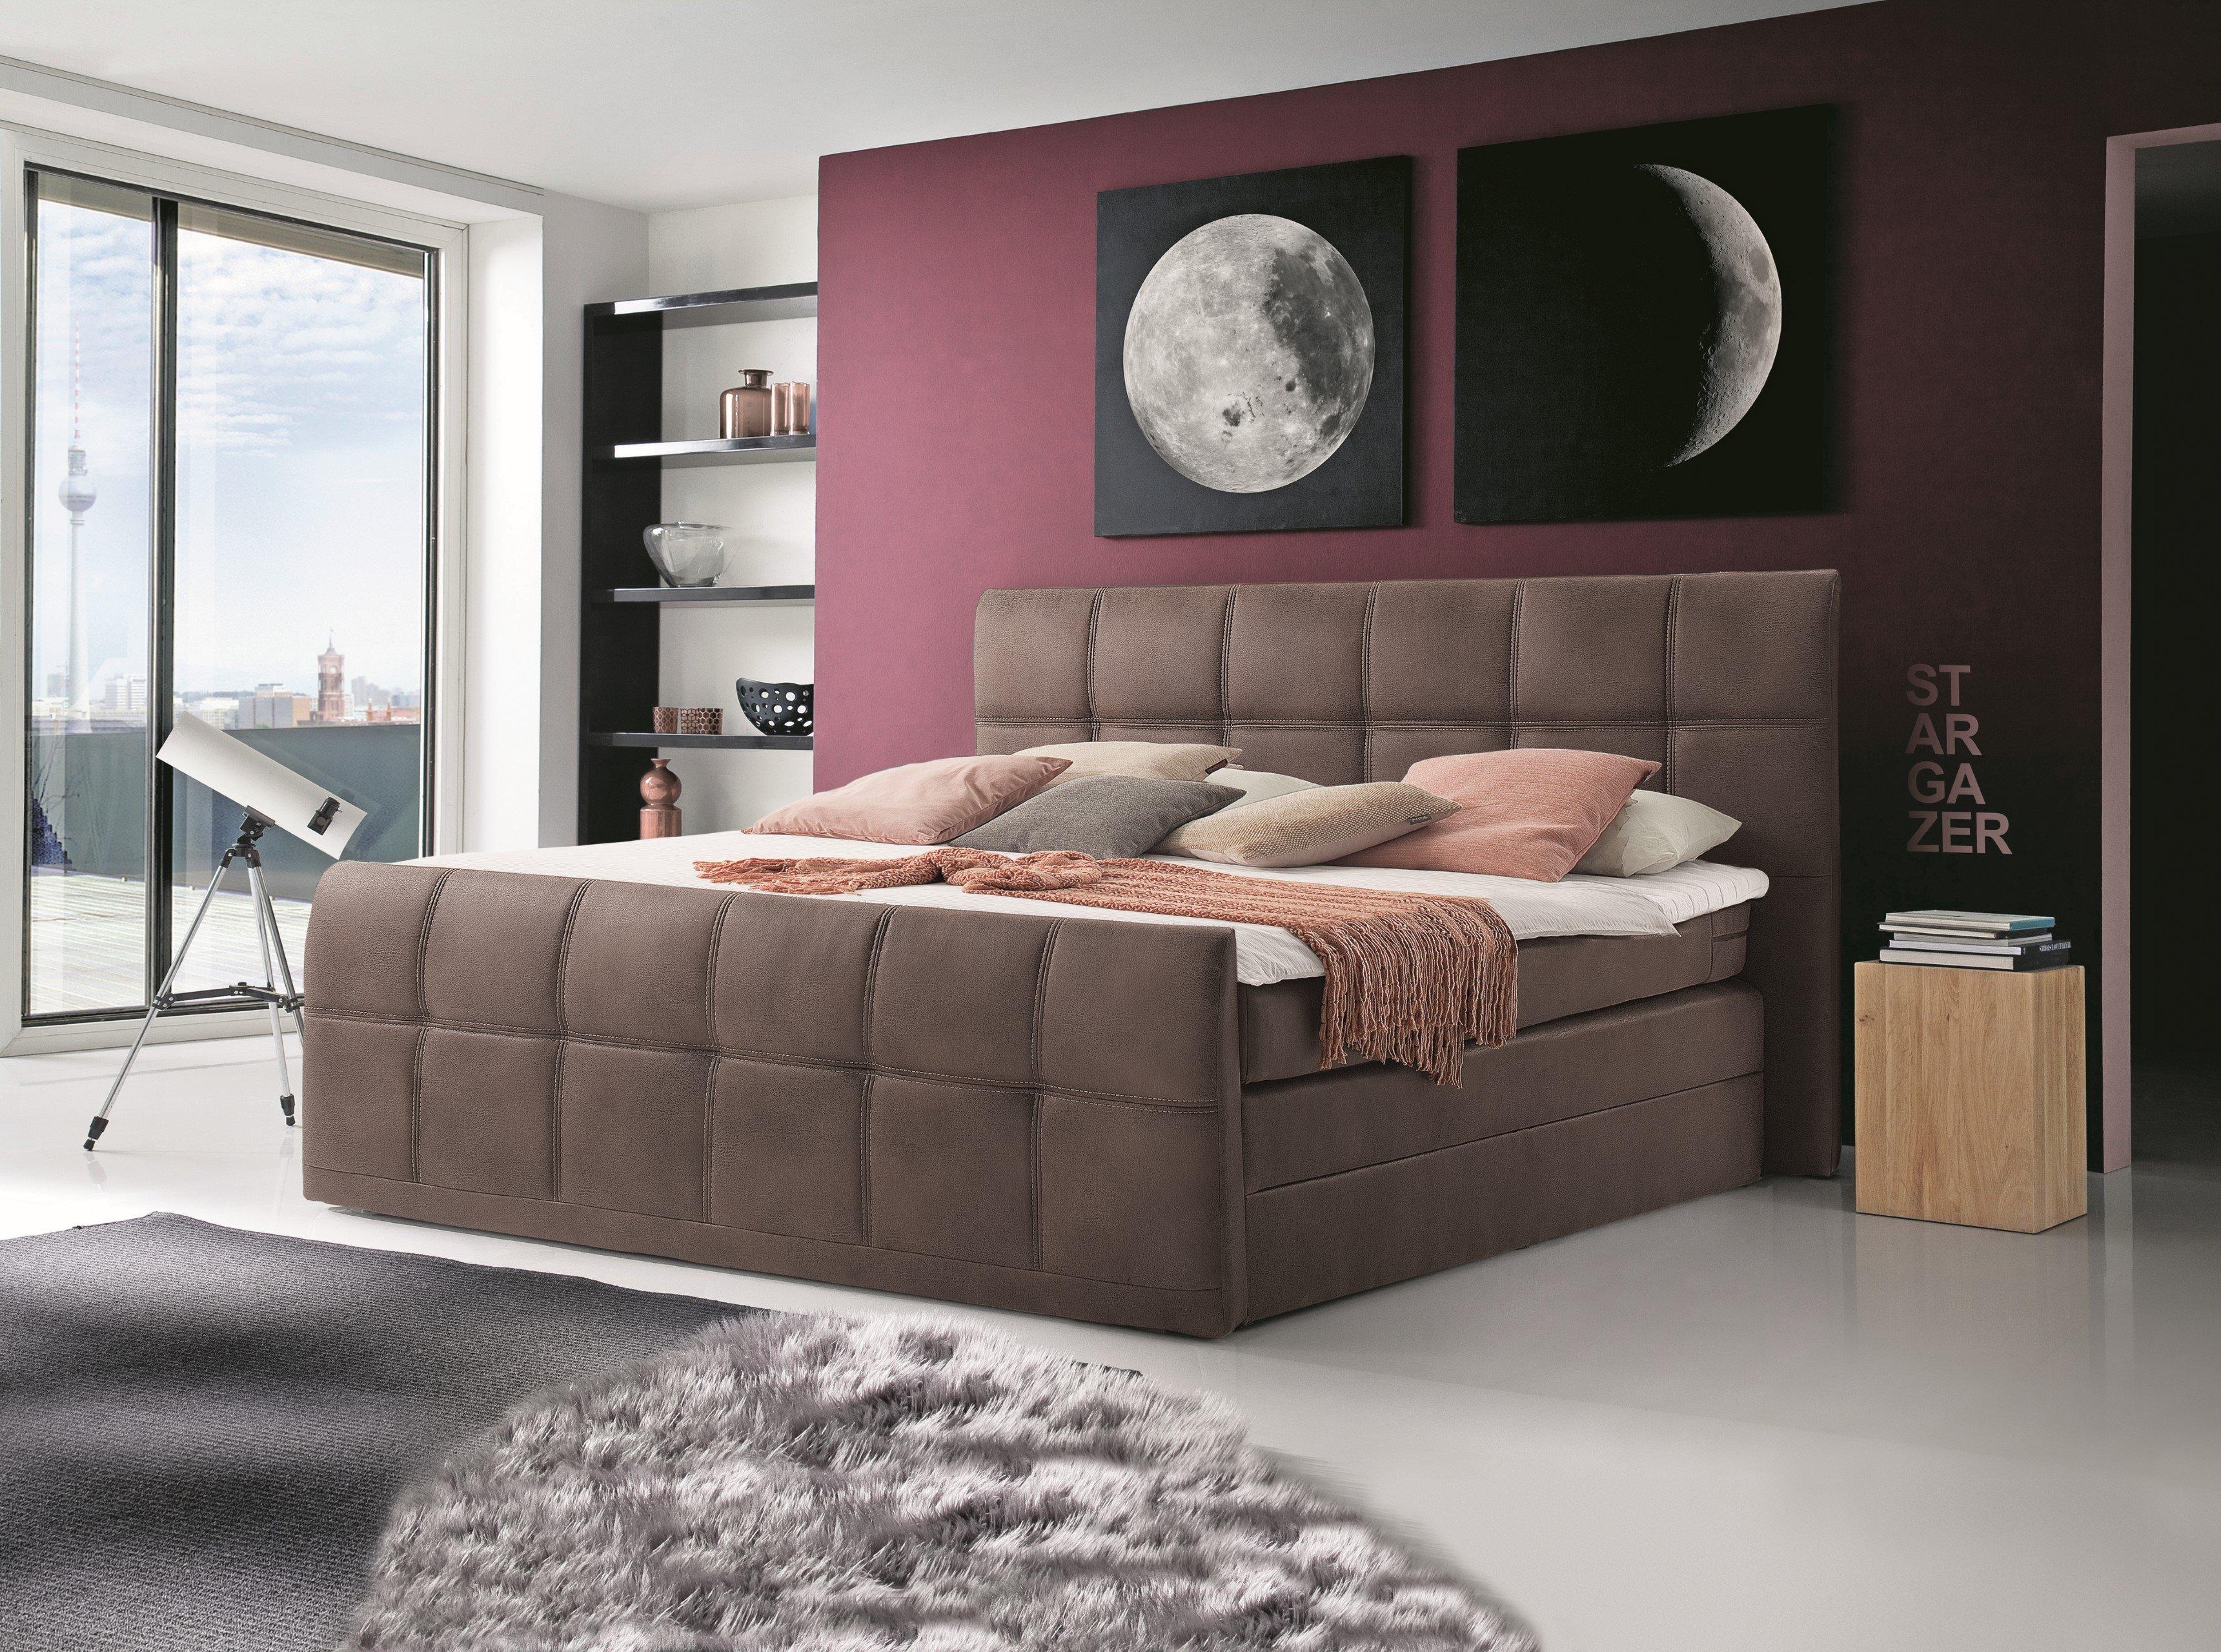 black red white aspen boxspringbett ca 180 x 200 cm m bel letz ihr online shop. Black Bedroom Furniture Sets. Home Design Ideas